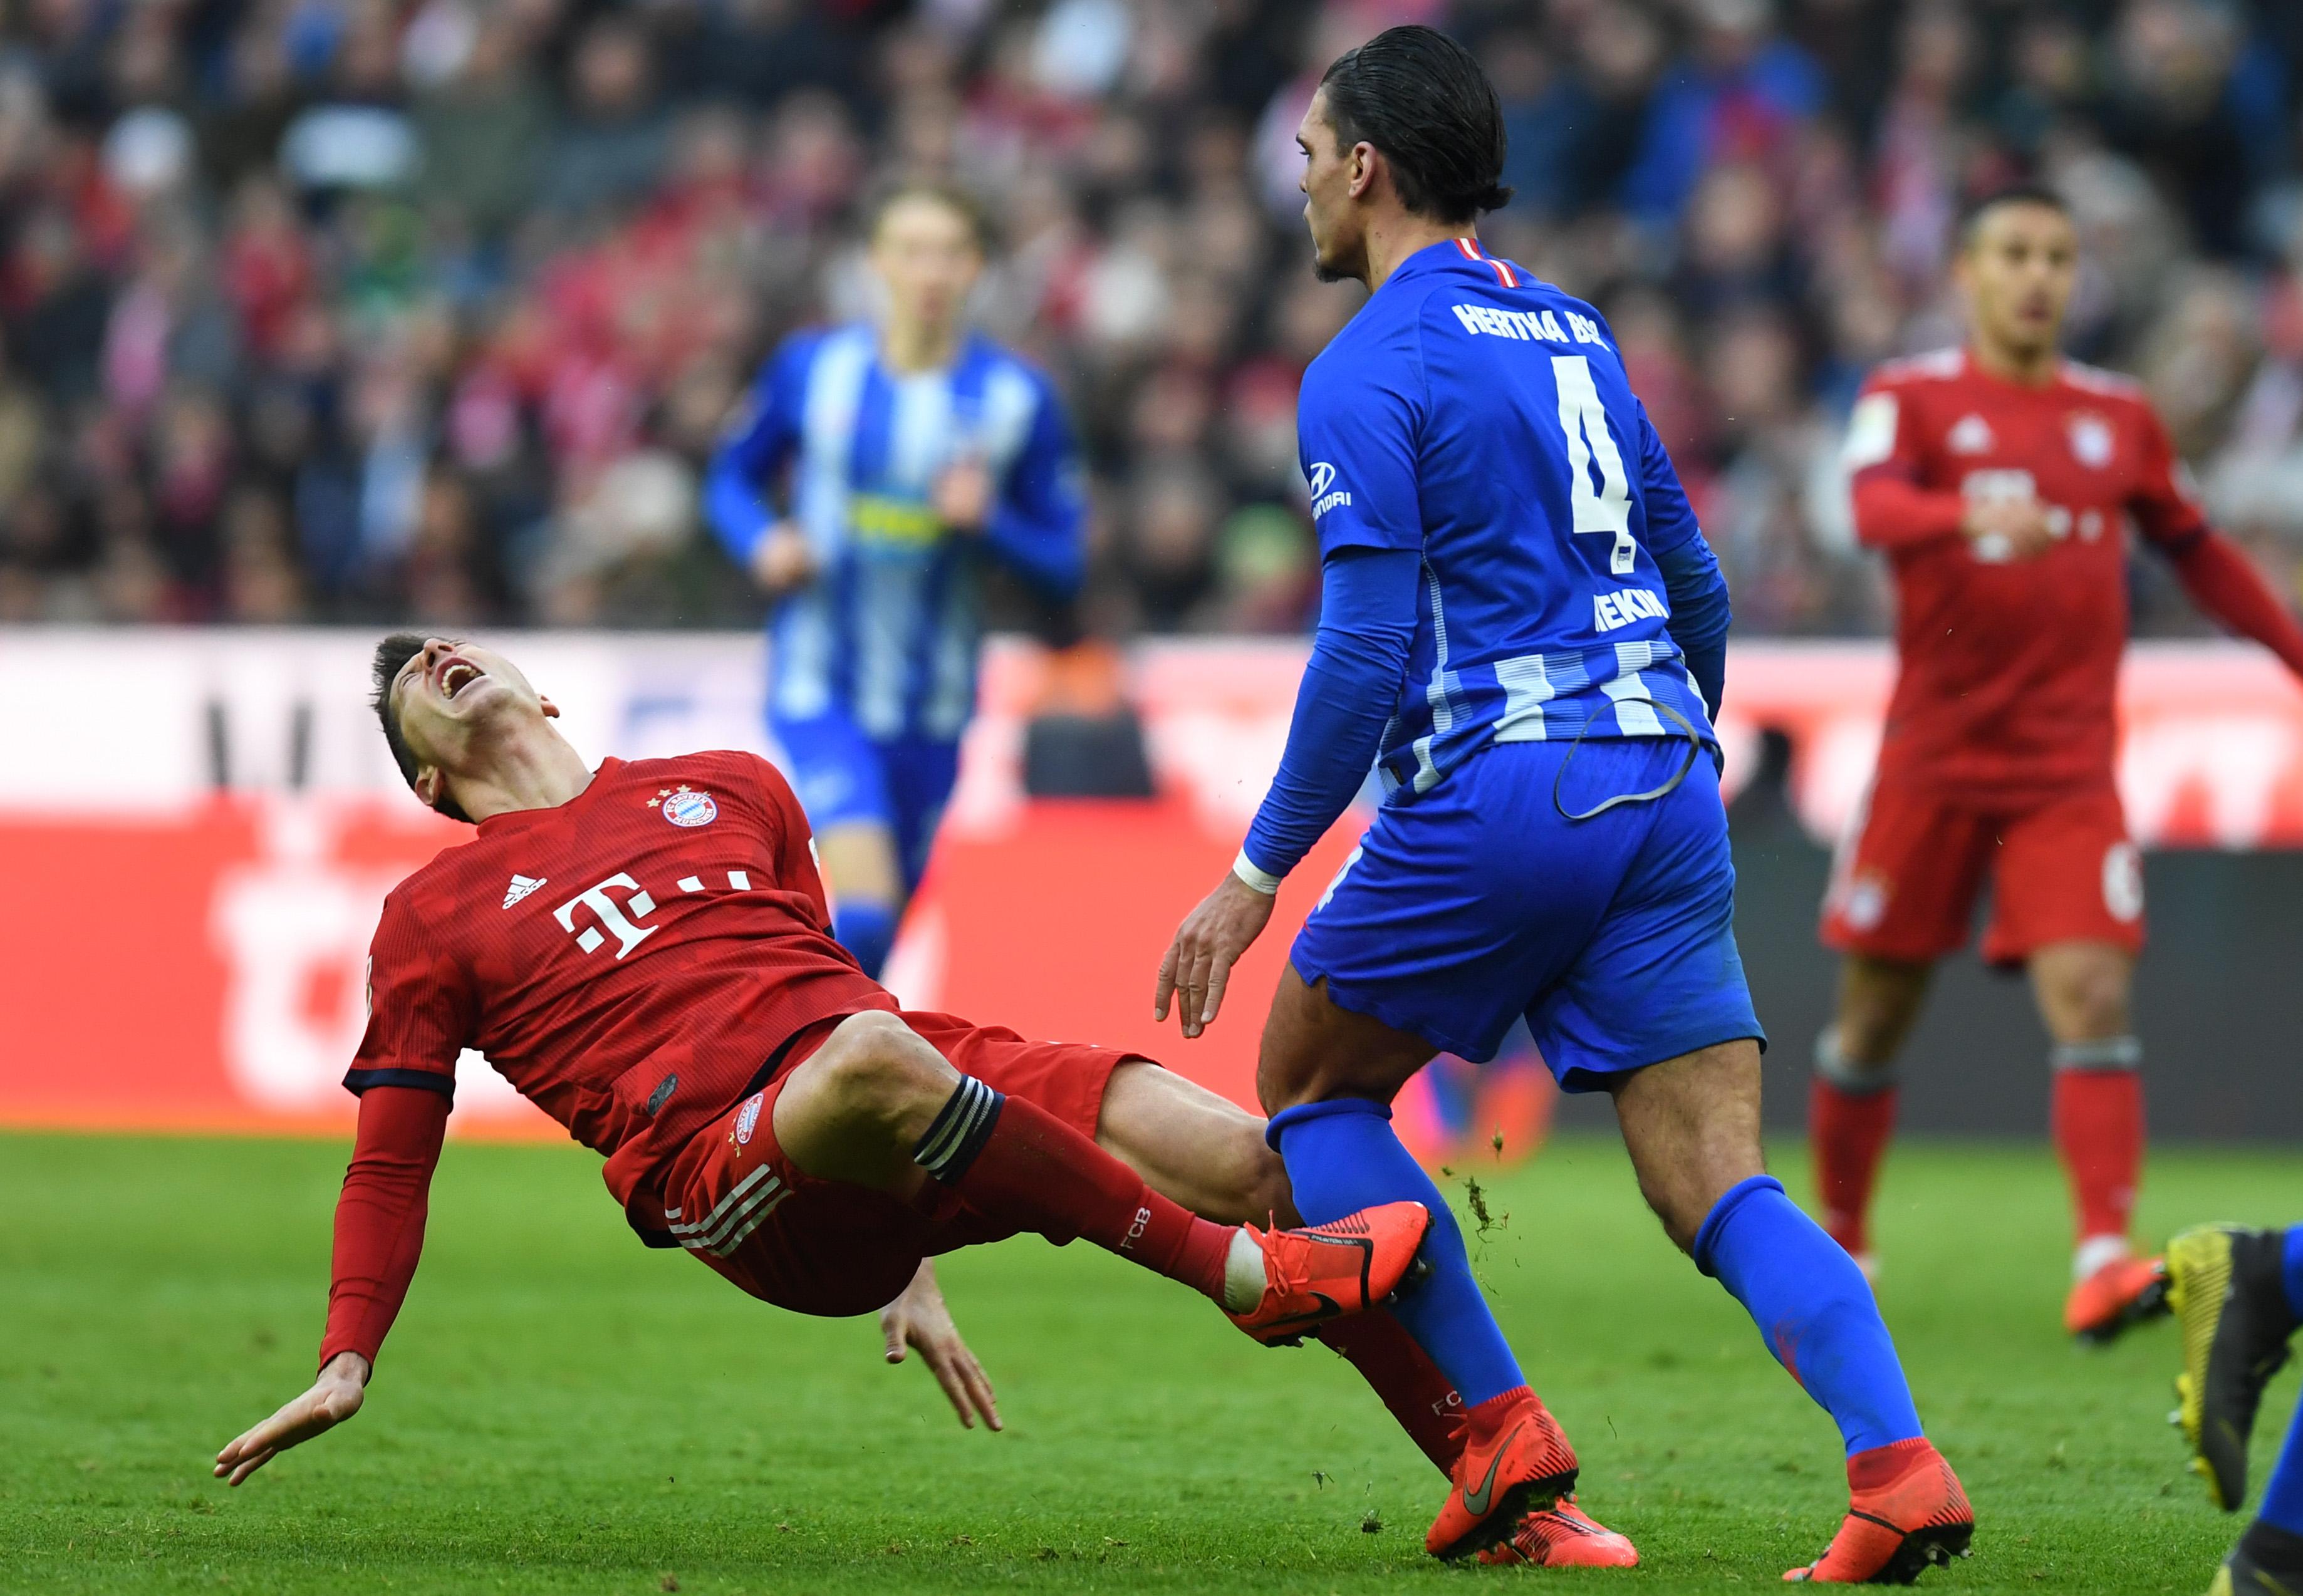 Bayern Munich's Polish striker Robert Lewandowski (L) falls after an attack of Berlin's midfielder Karim Rekik (R) during the German first division Bundesliga football match Bayern Munich vs Hertha Berlin in Munich on February 23, 2019.